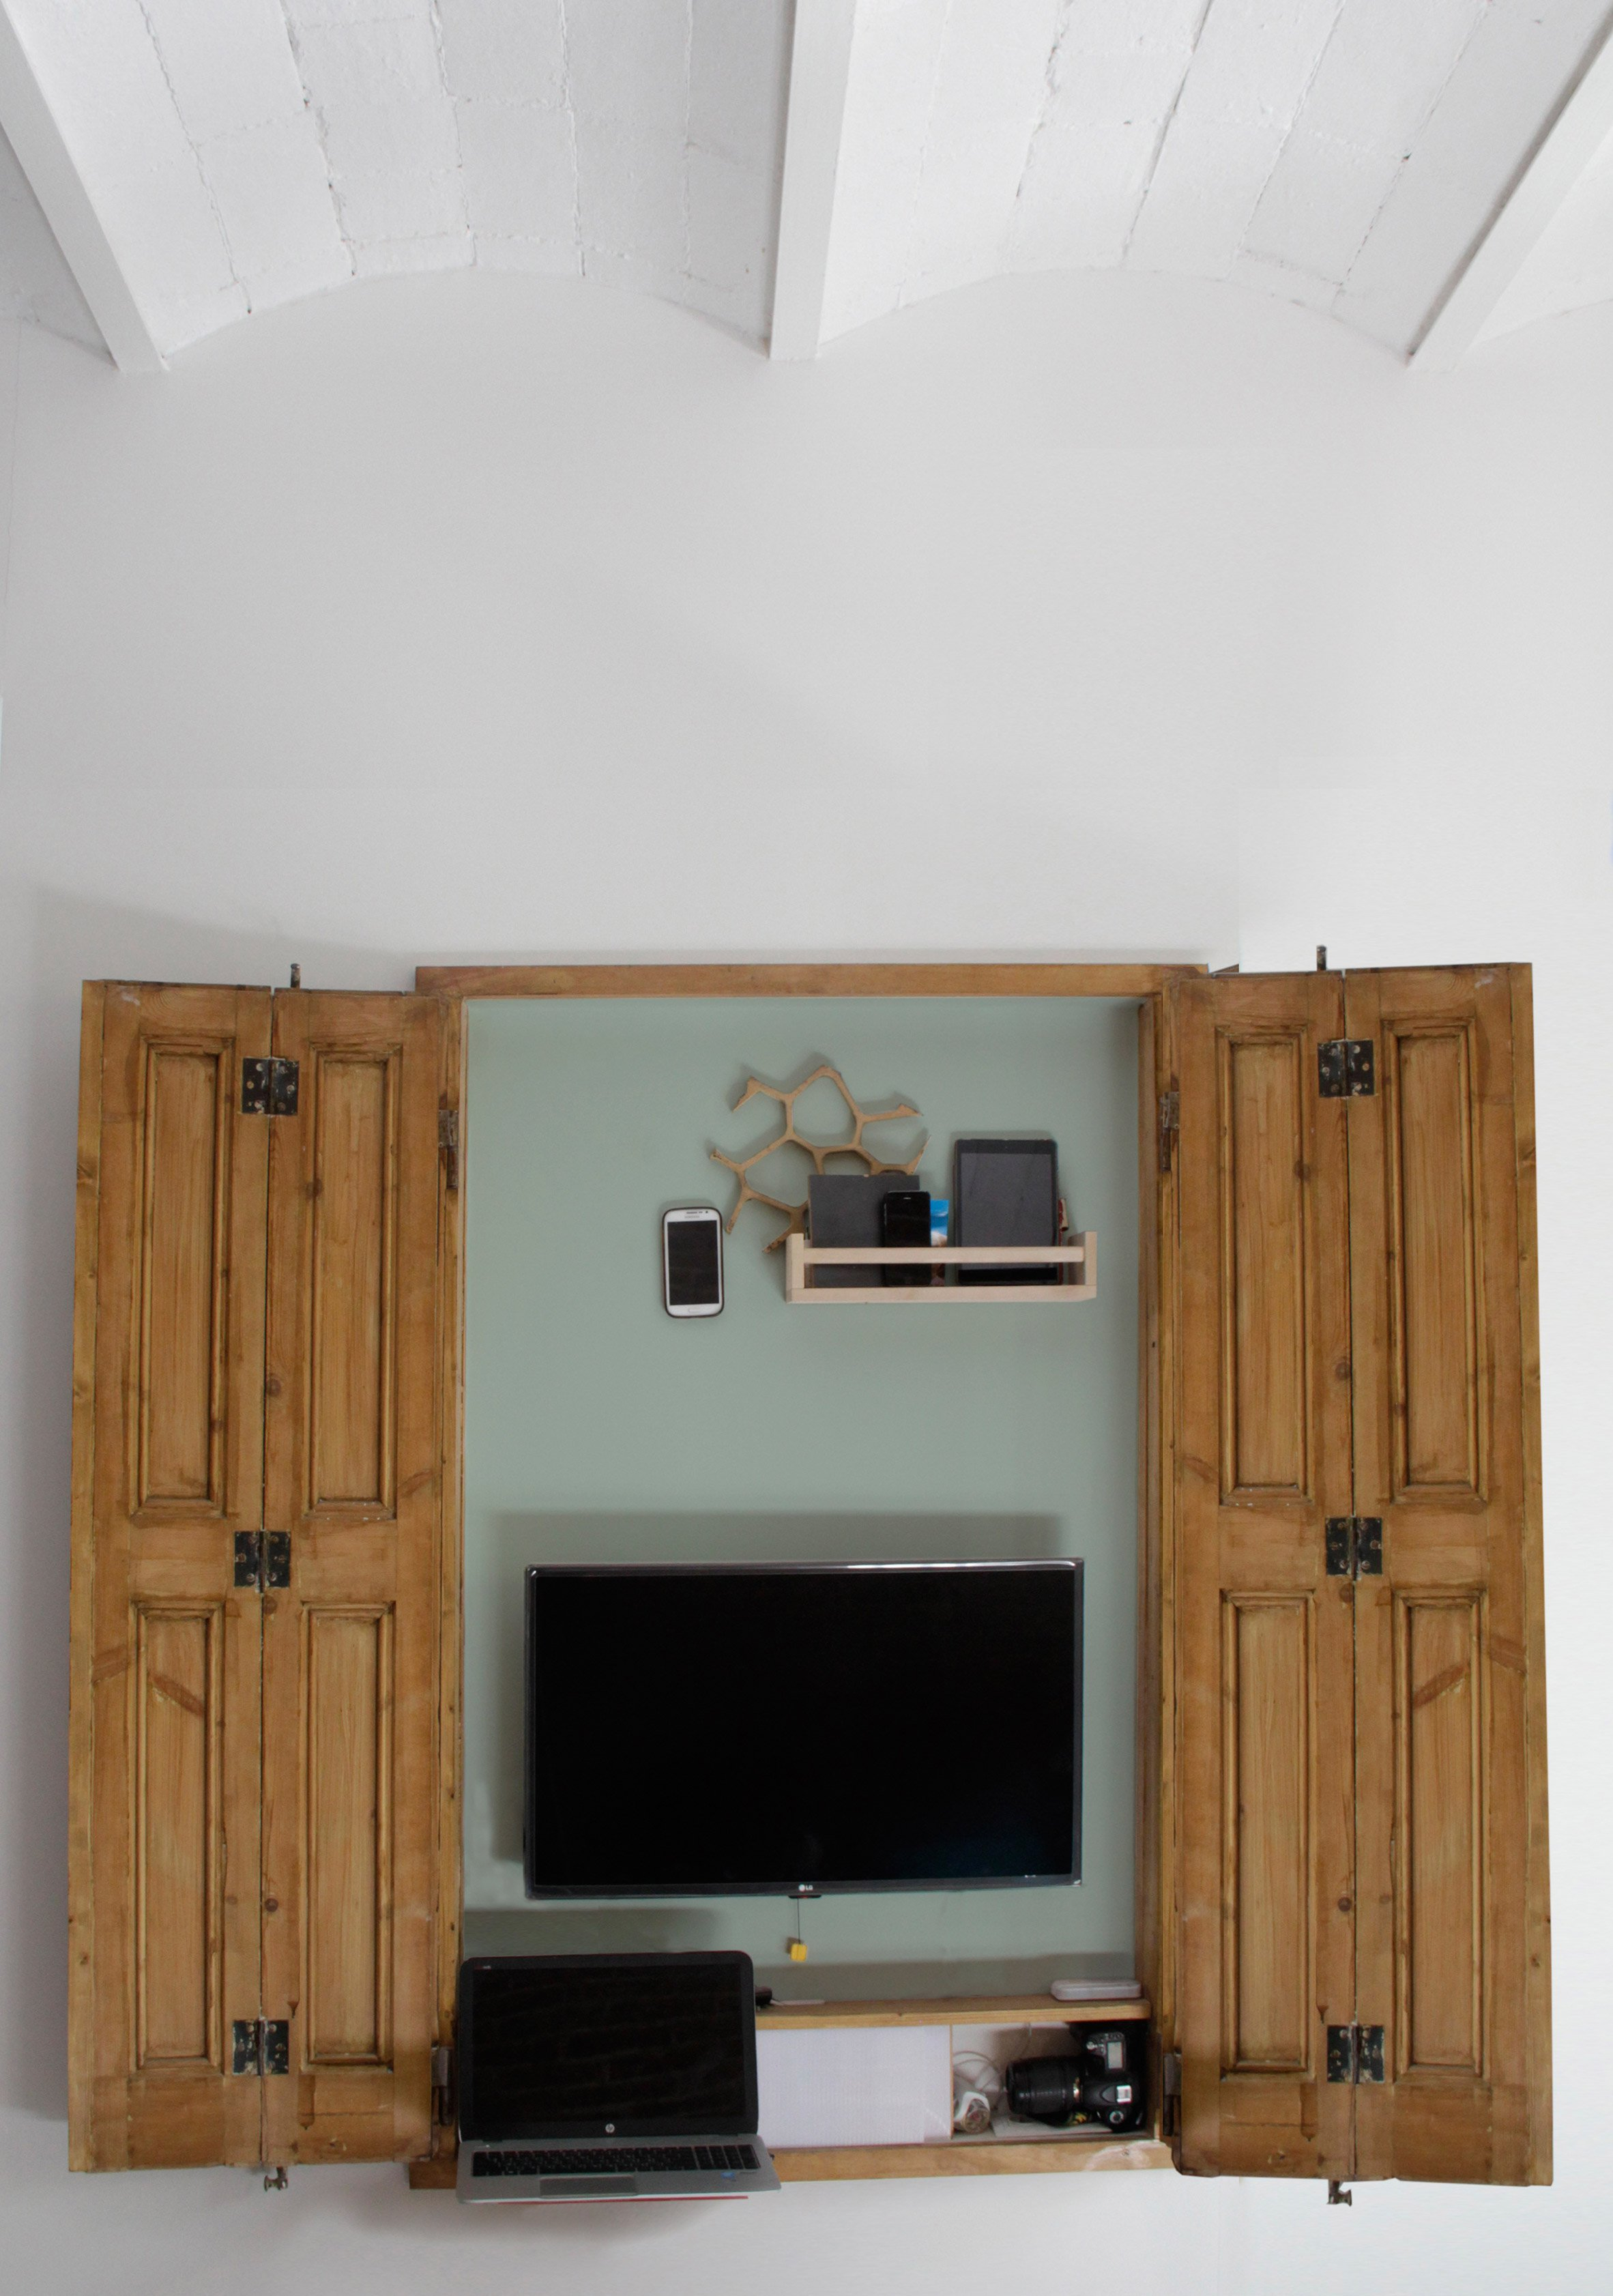 architecture-25m2-loft-interior-design-studia-osnovadesign-osnova-poltava_06